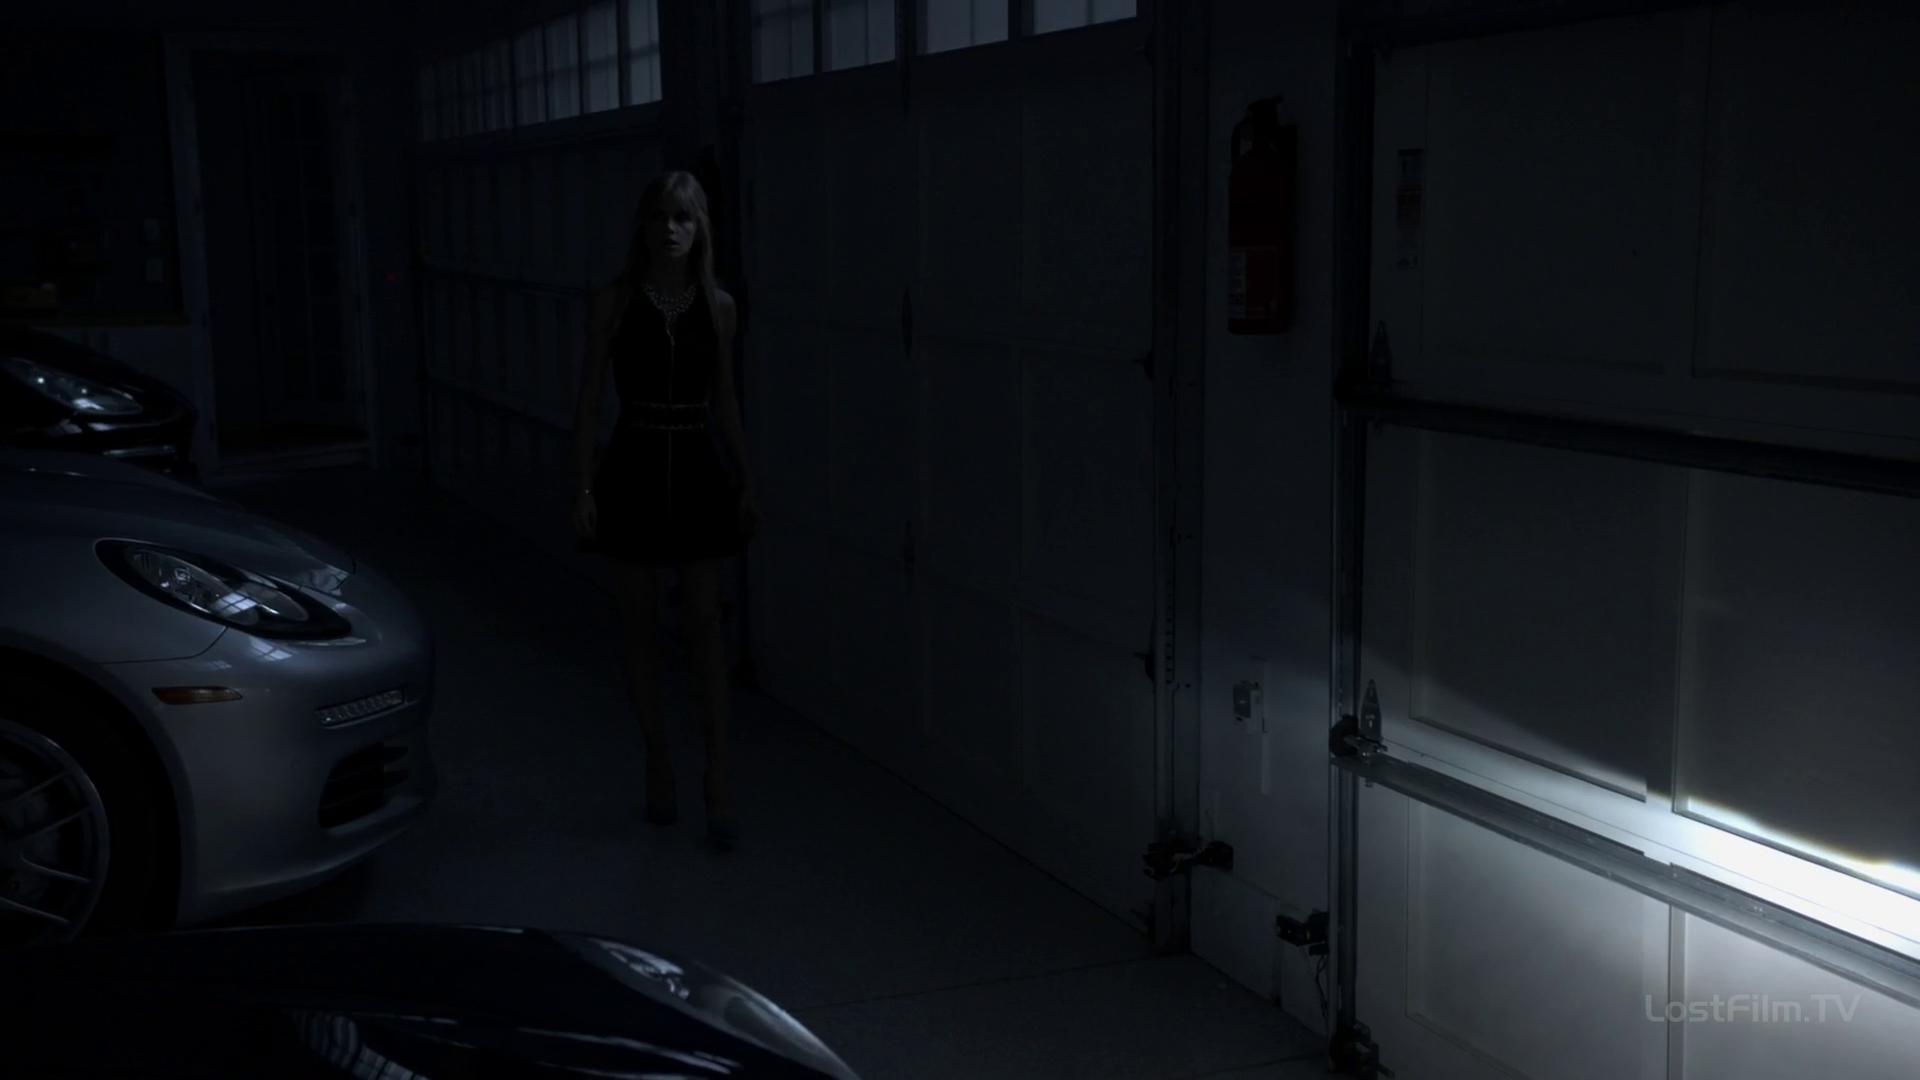 Крик / Scream (1 сезон: 1-10 серии из 10) (2015) WEB-DL 1080p | LostFilm